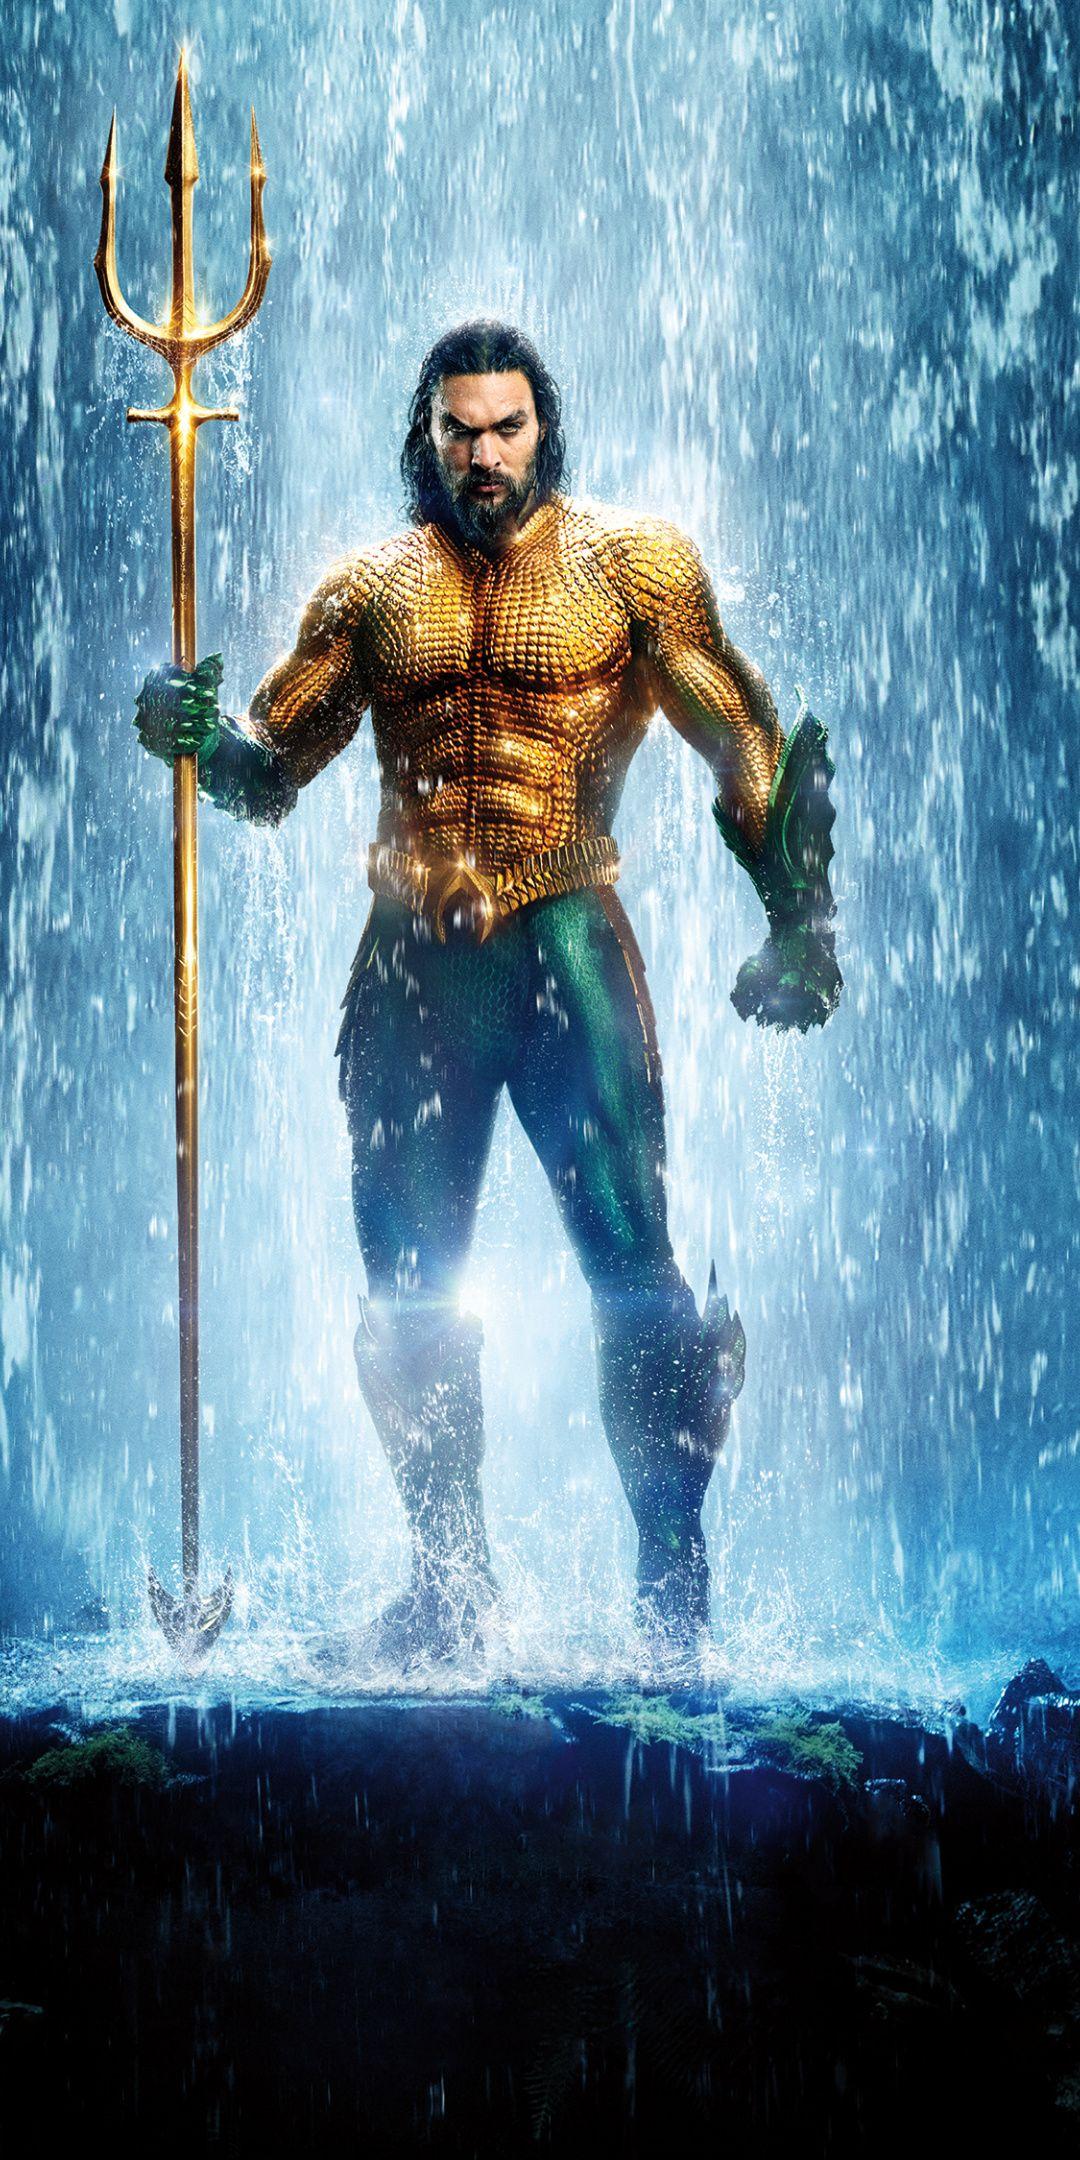 Aquaman jason momoa poster 2018 1080x2160 wallpaper - Movie poster wallpaper ...